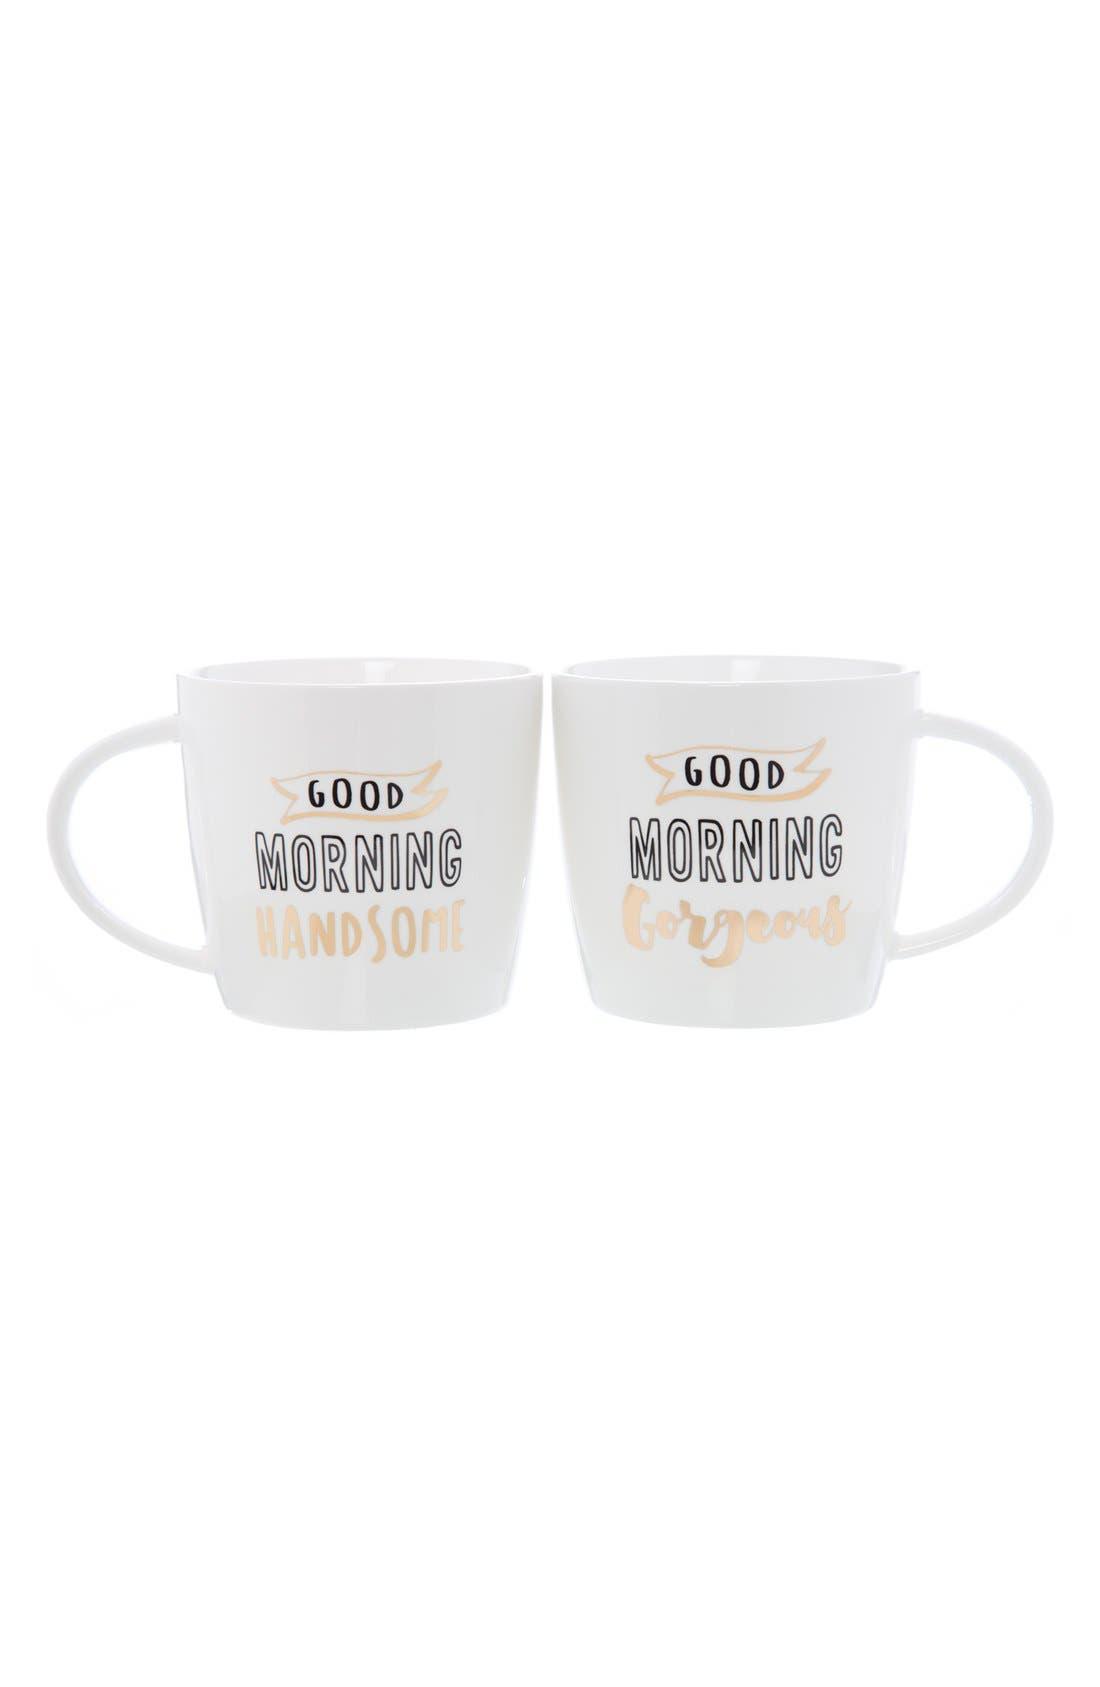 'Good Morning' Ceramic Coffee Mugs,                         Main,                         color, White